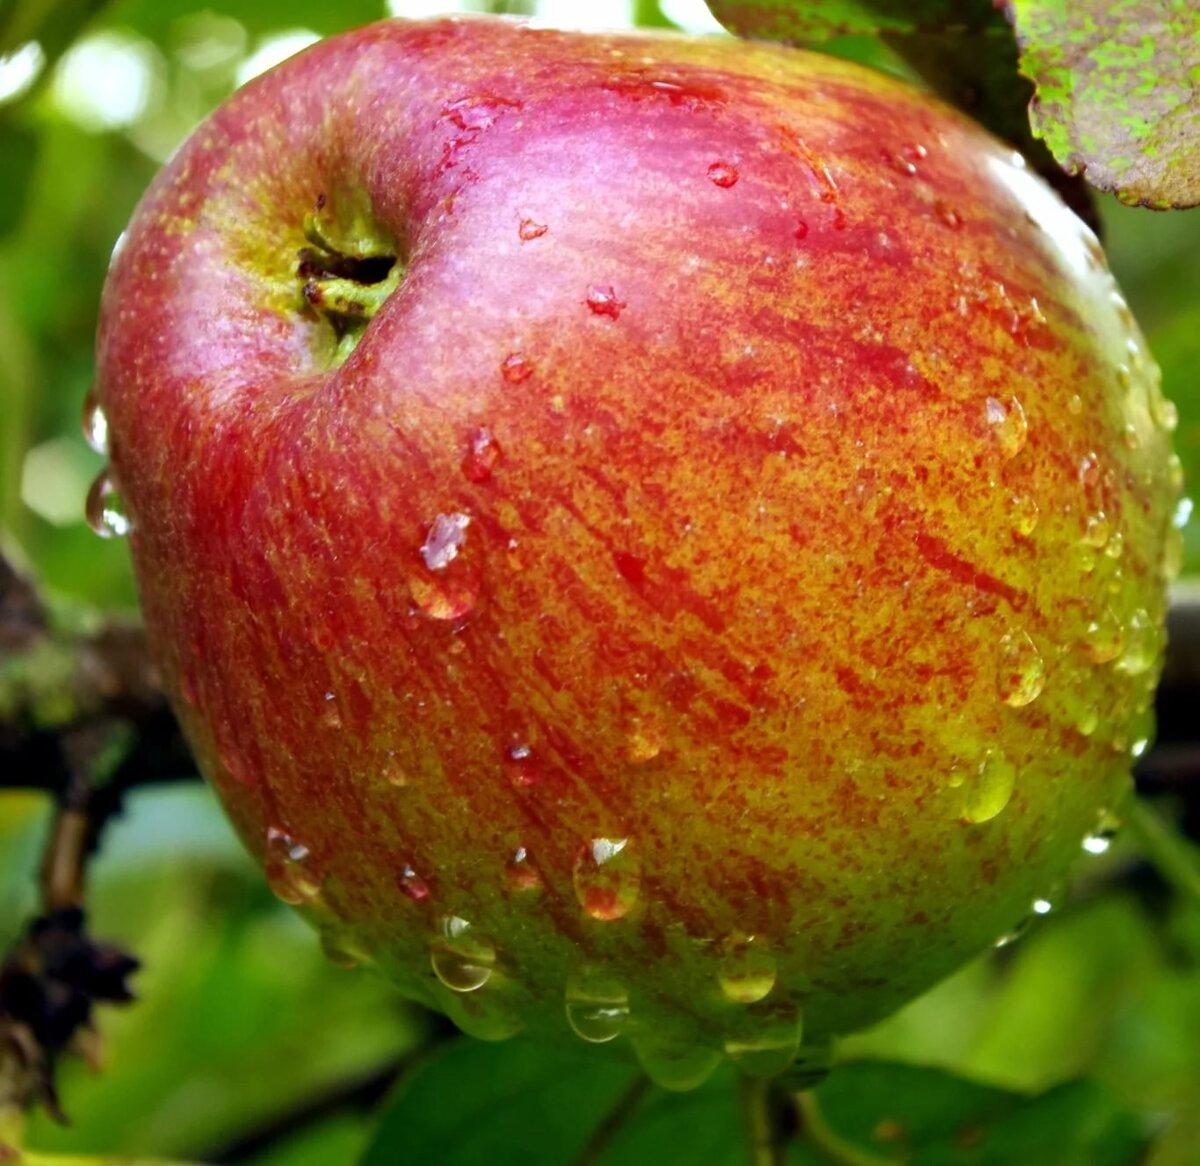 картинки сорта яблок джонатан желанию можно